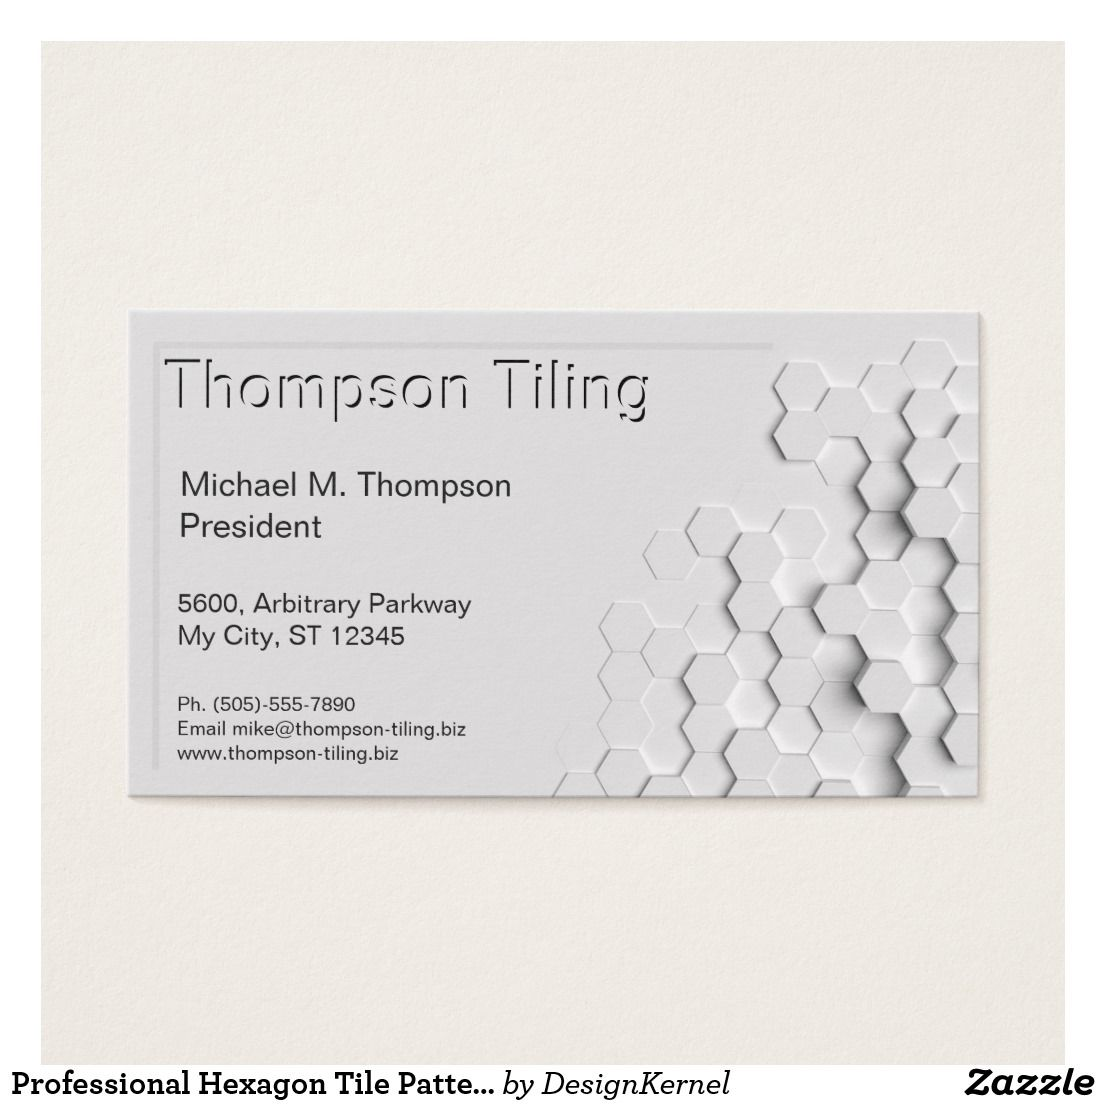 Professional Hexagon Tile Pattern Elegant Modern Business Card Zazzle Com In 2021 Modern Business Cards Simple Business Cards Hexagon Tile Pattern